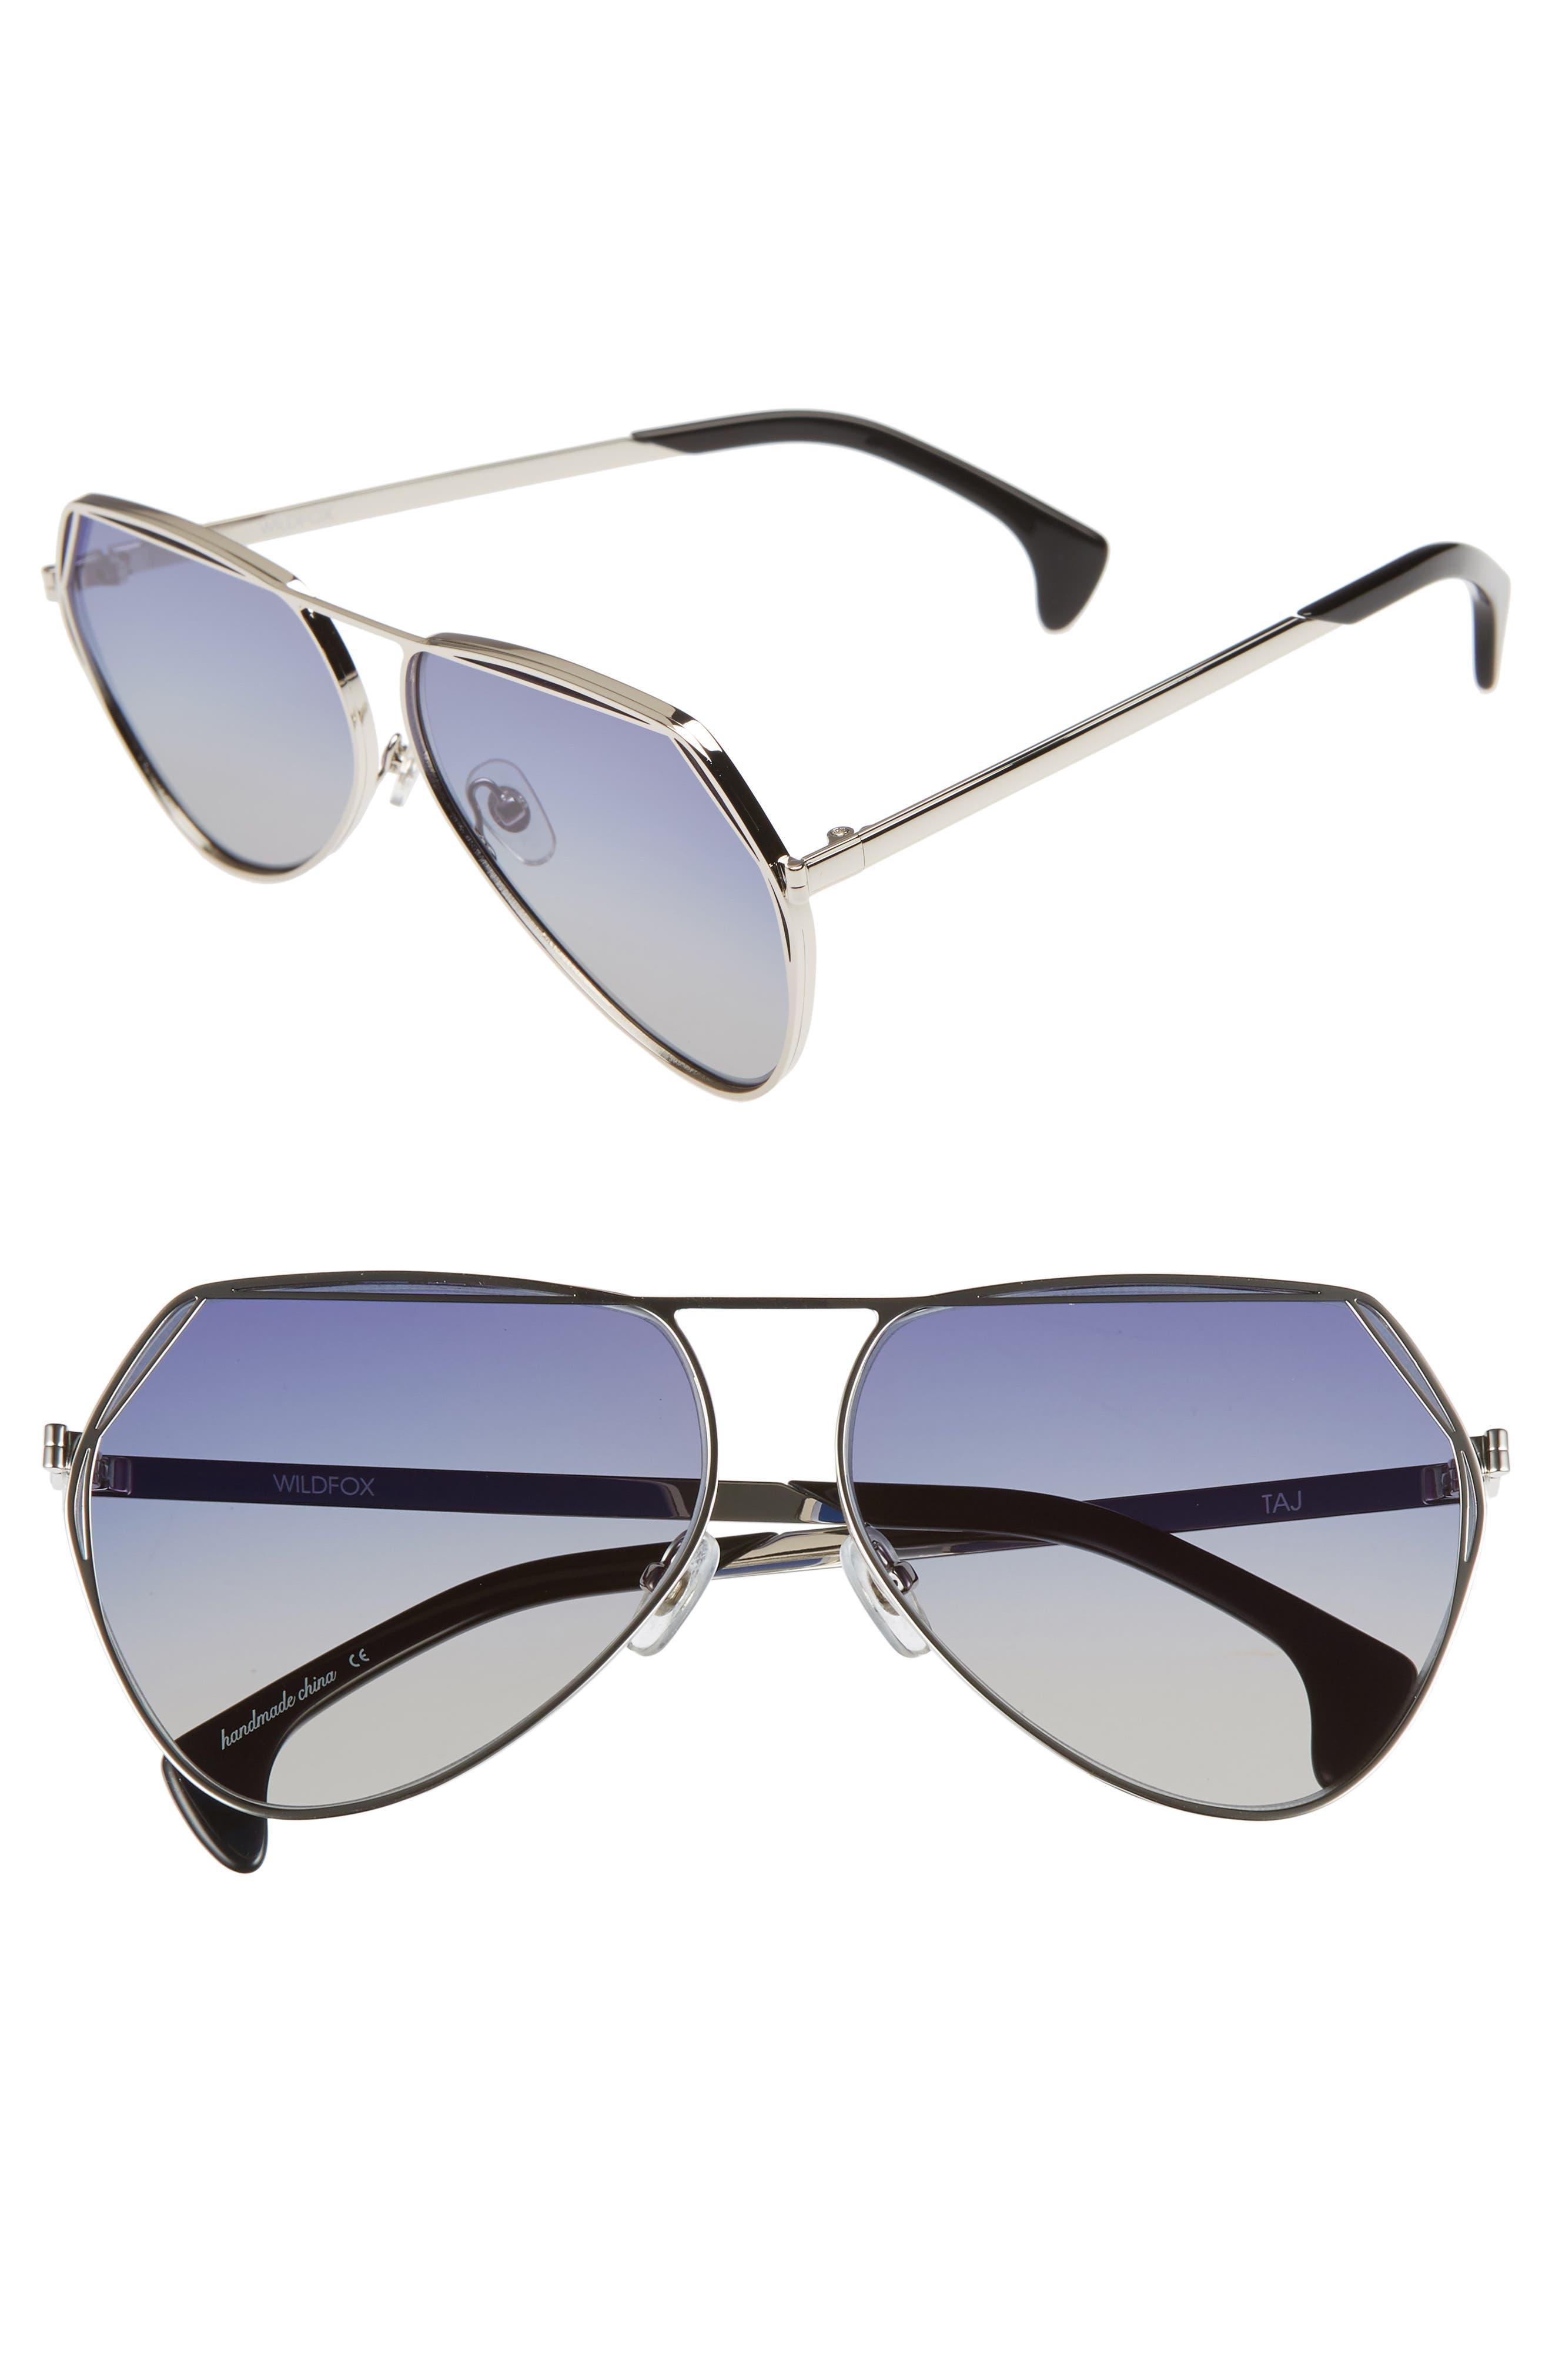 Taj 62mm Oversize Aviator Sunglasses,                         Main,                         color, SILVER/ GREY-BLUE GRADIENT